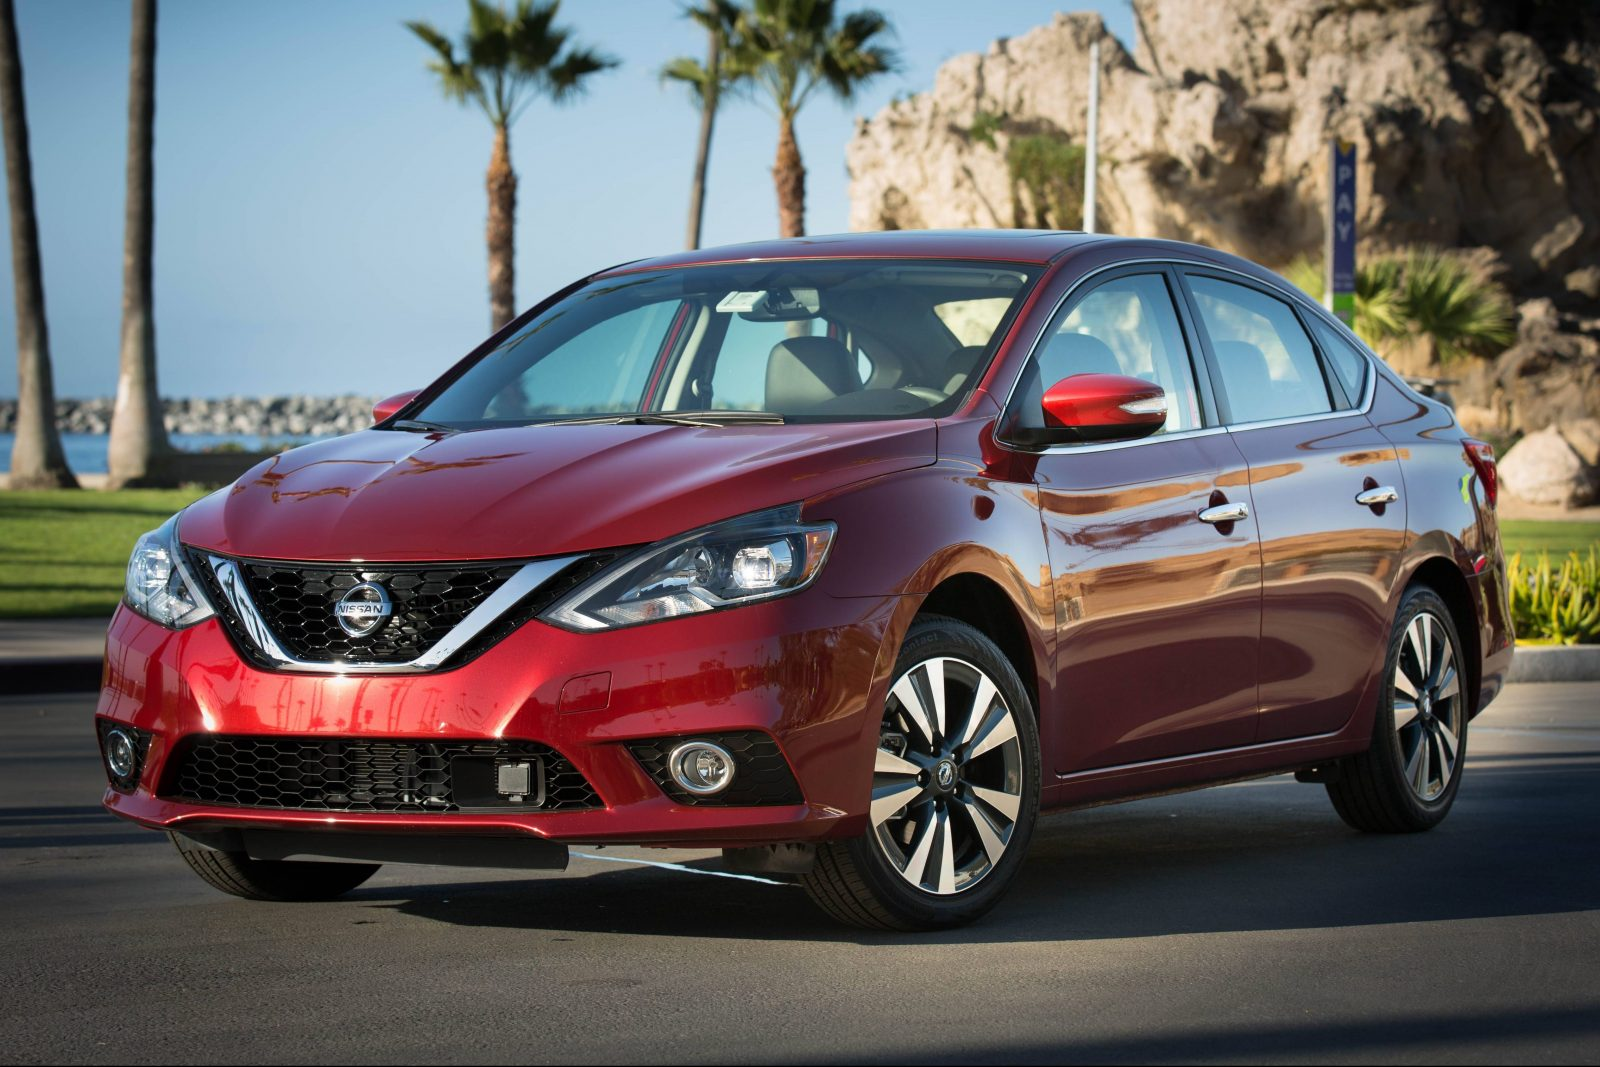 Nissan Sentra facelift 2016 (1)